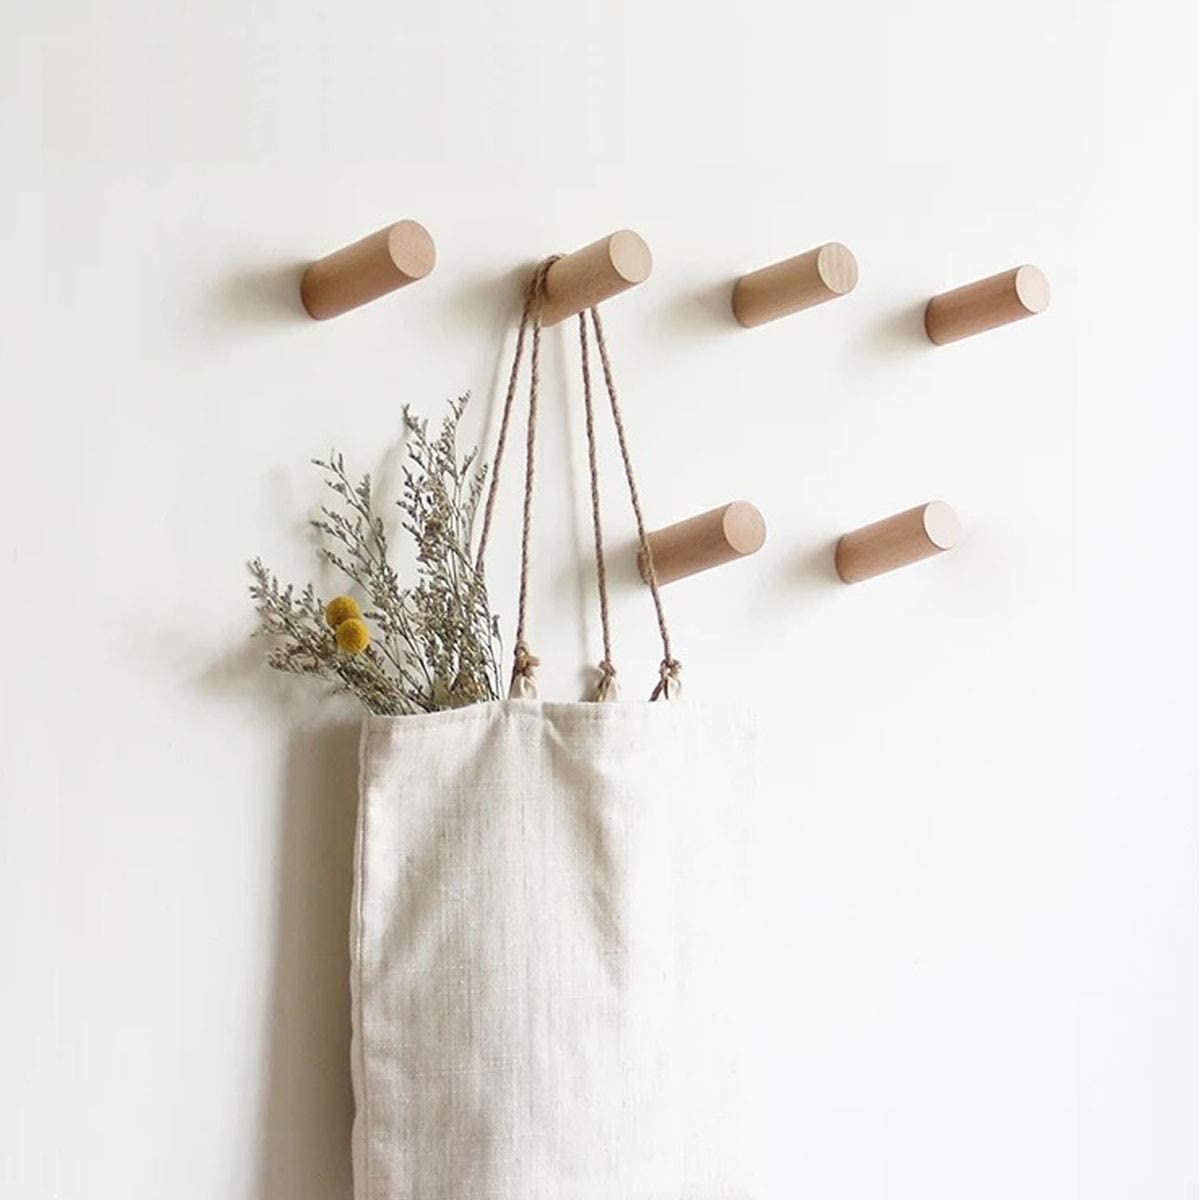 HomeDo Natural Wooden Coat Hooks Wall Mounted Vintage Single Organizer Hangers Beech-2pcs, 3inch Handmade Craft Hat Rack Hat Hanger